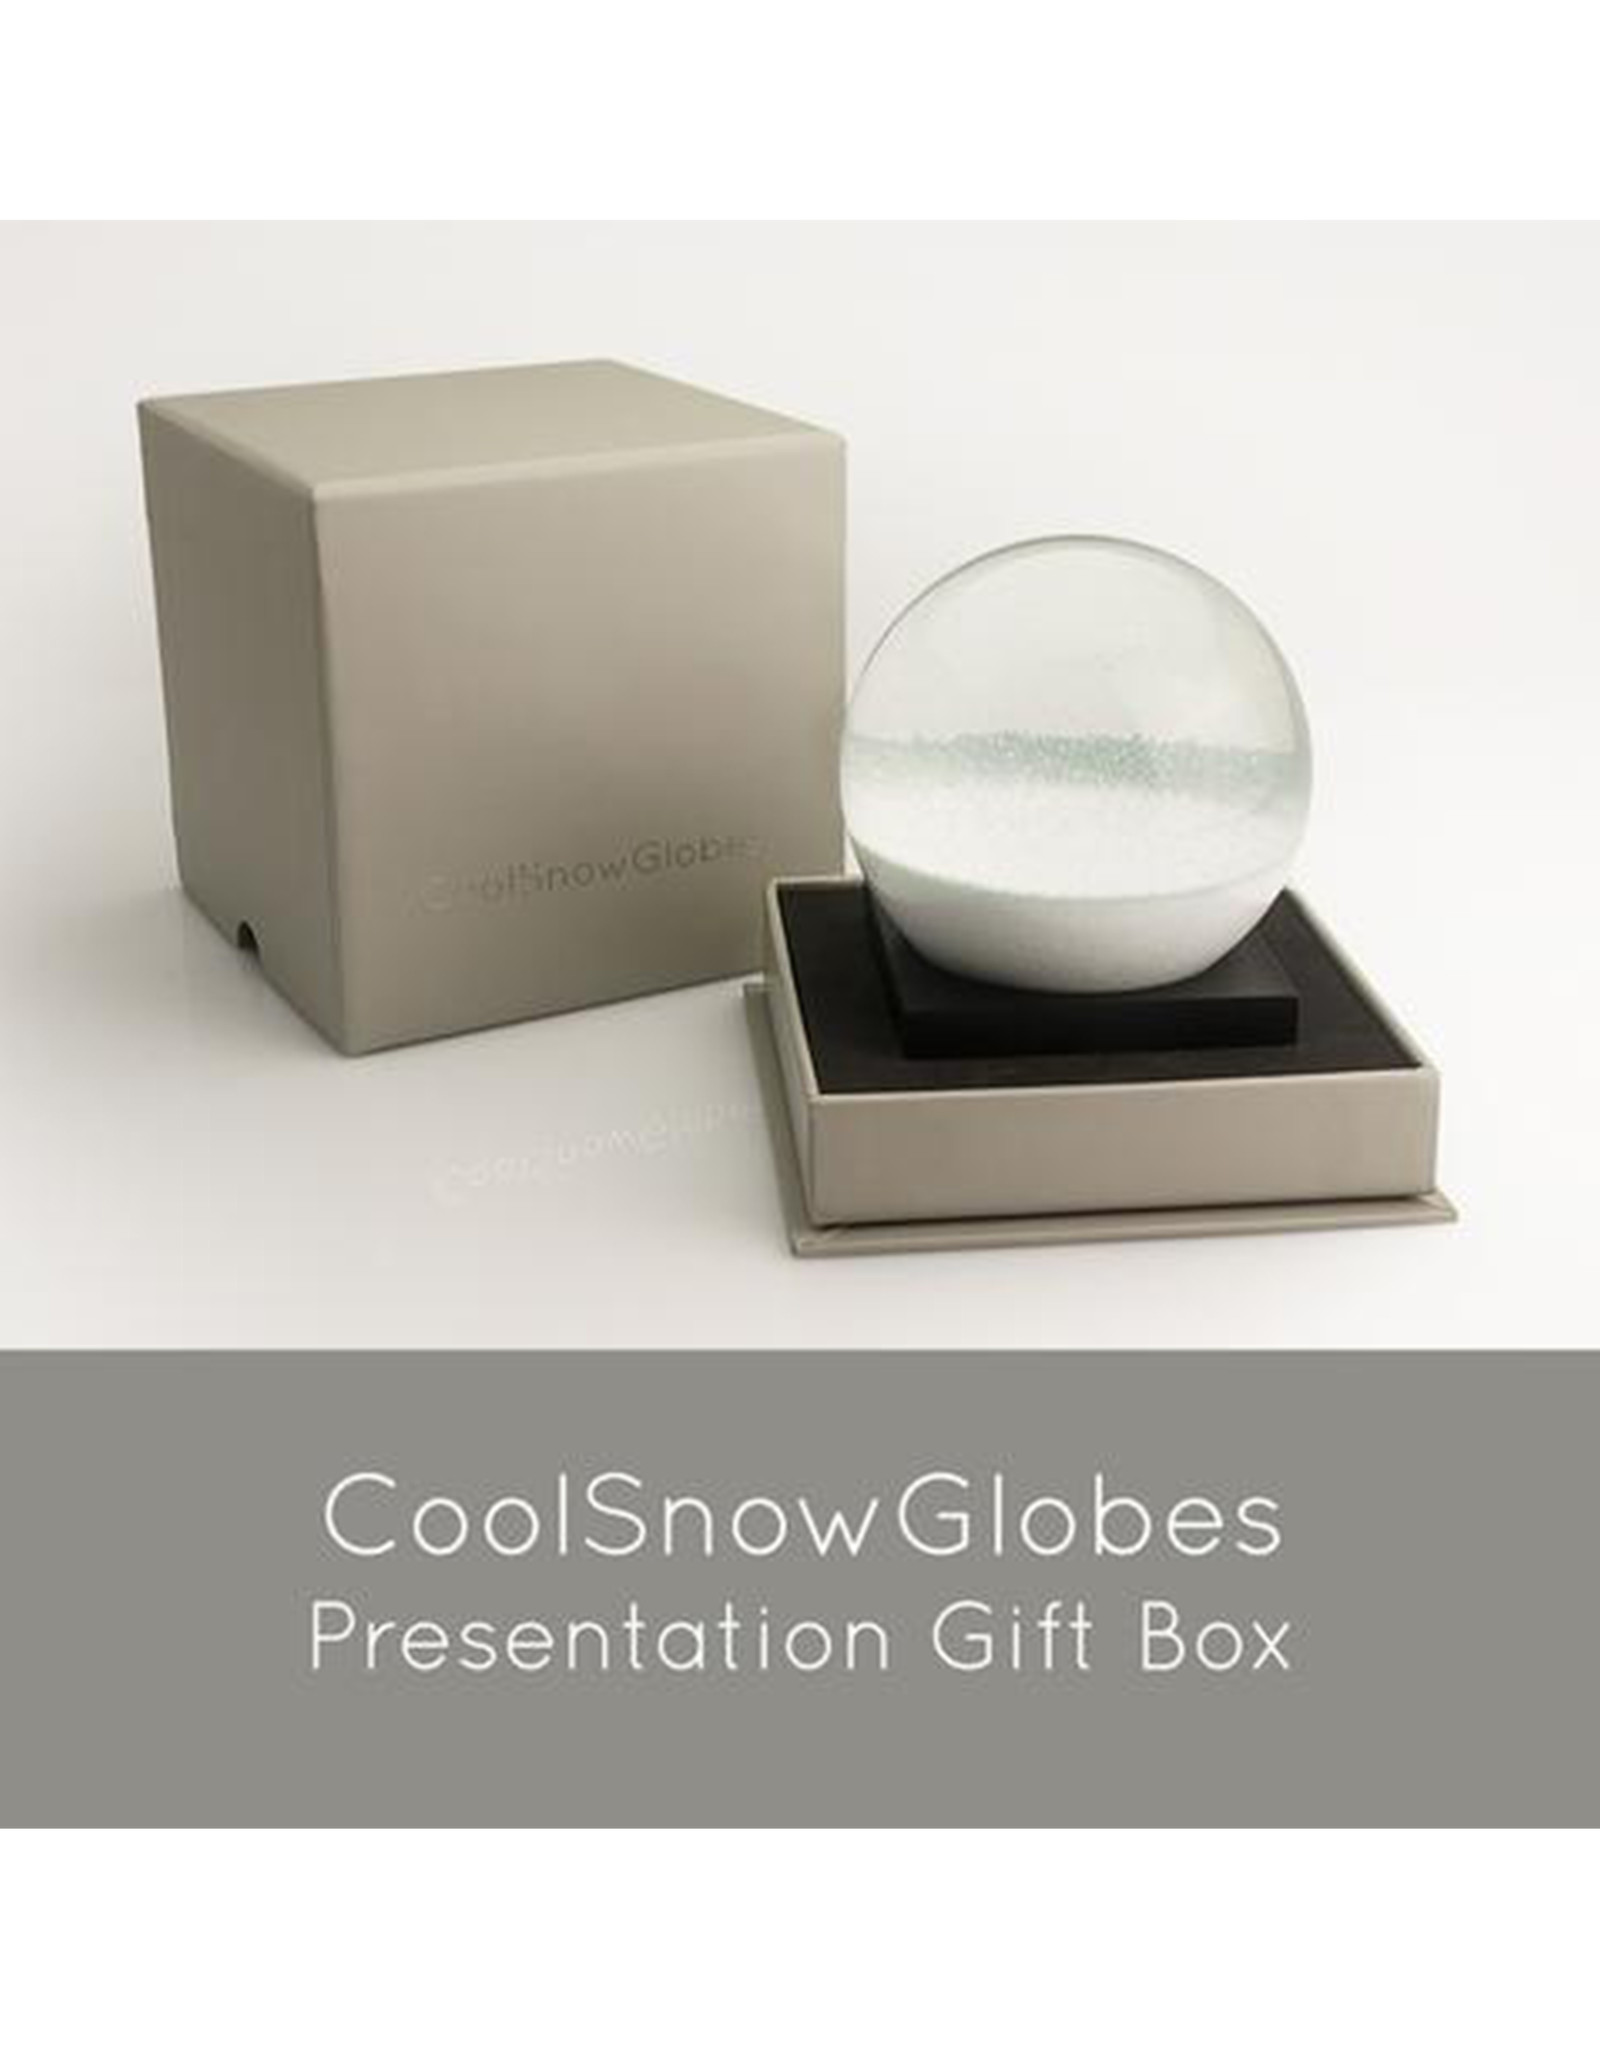 COOL SNOW GLOBES CAIRN SNOW GLOBE